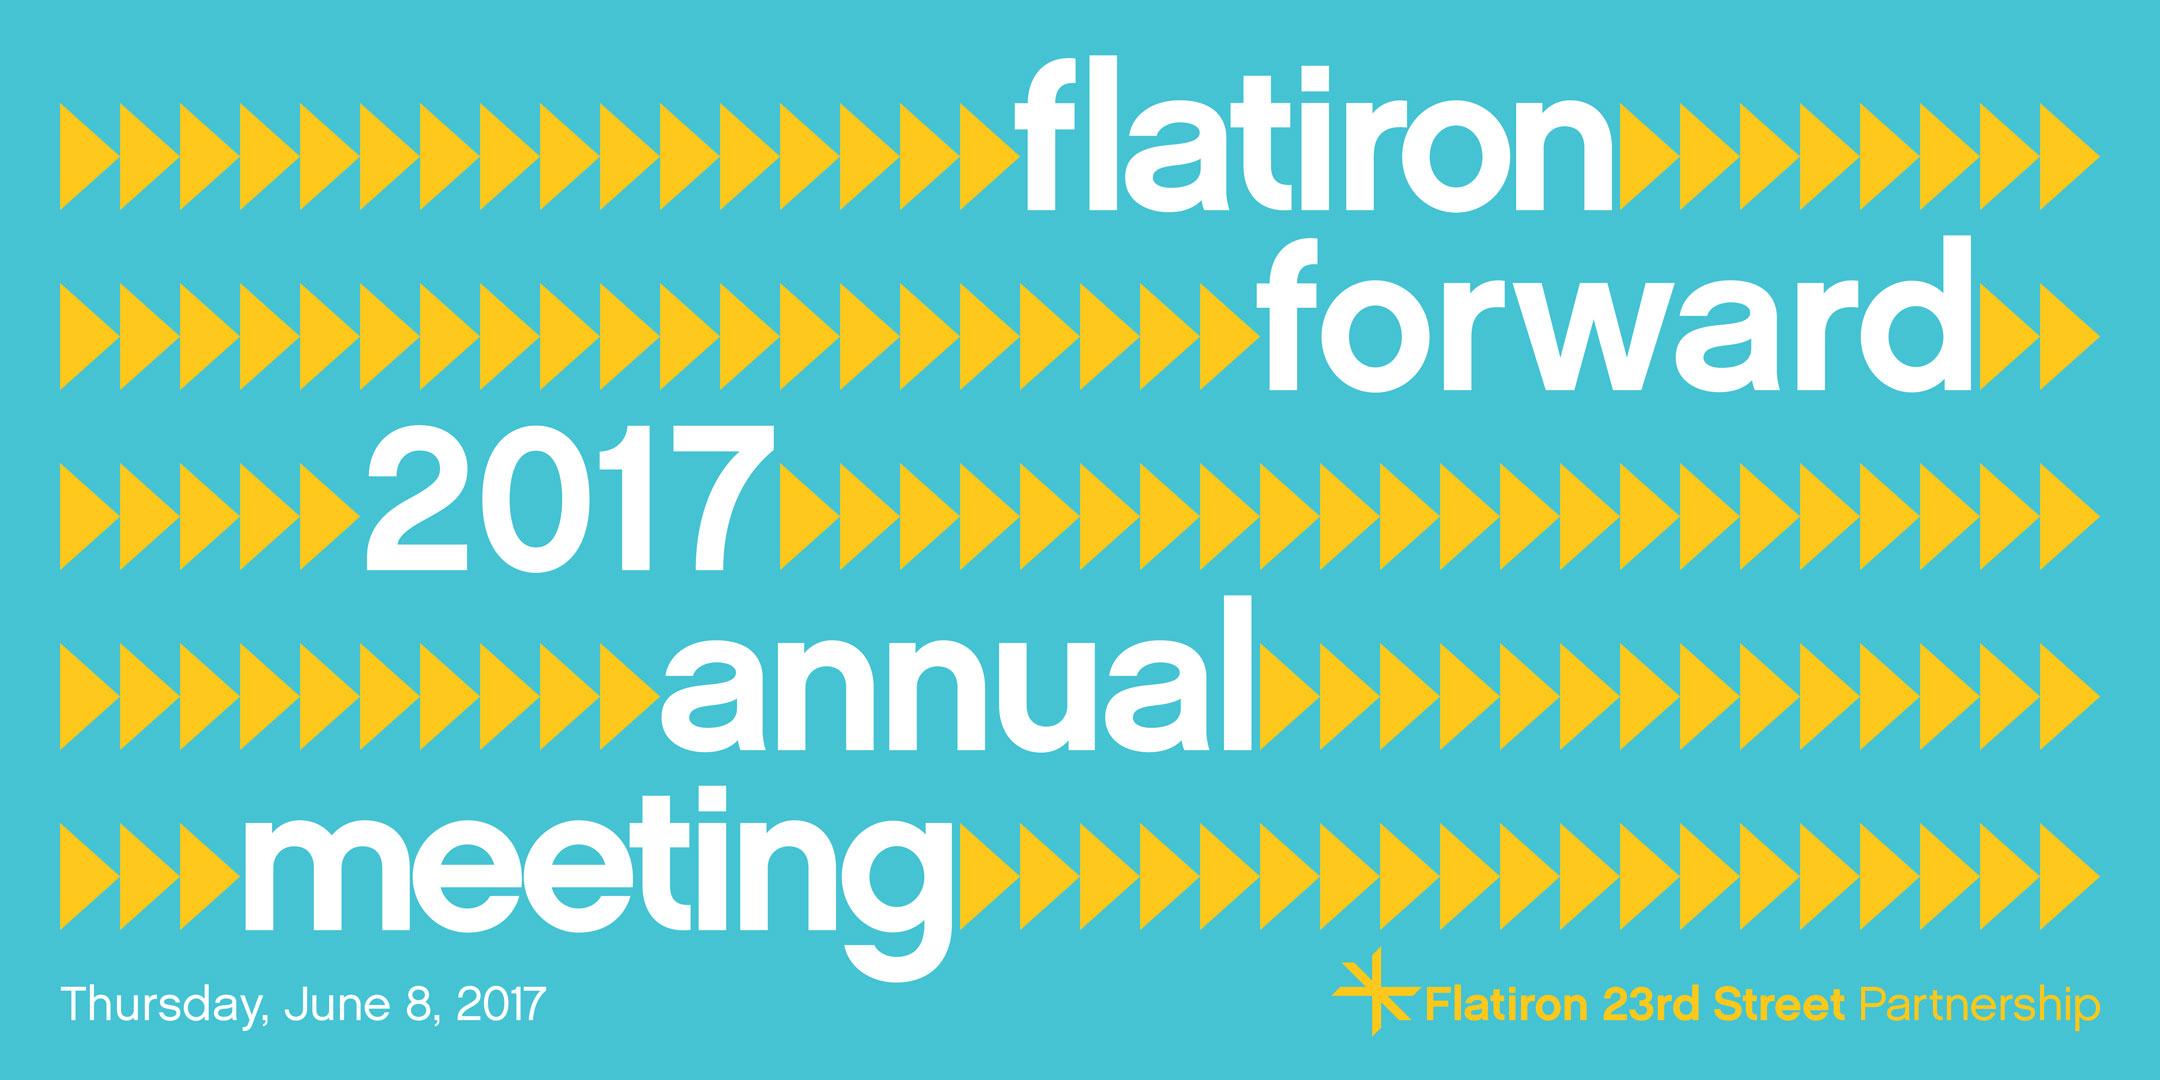 2017 Annual Meeting Invitation